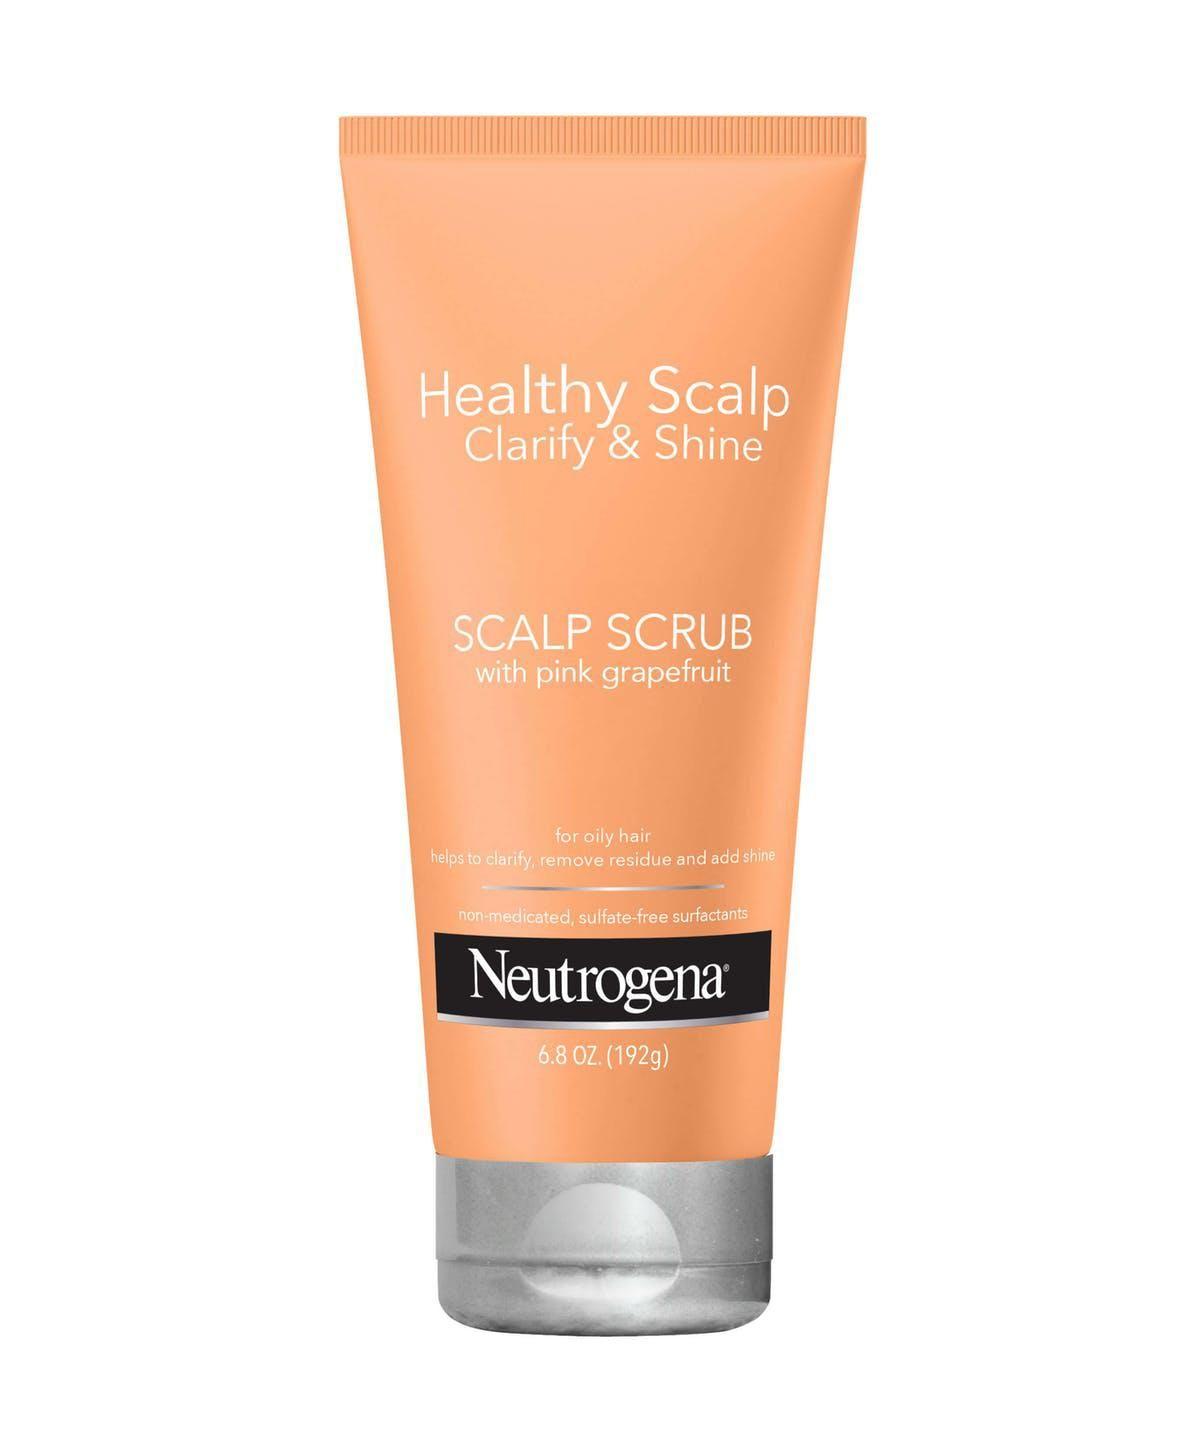 Healthy Scalp Clarify and Shine Scalp Scrub